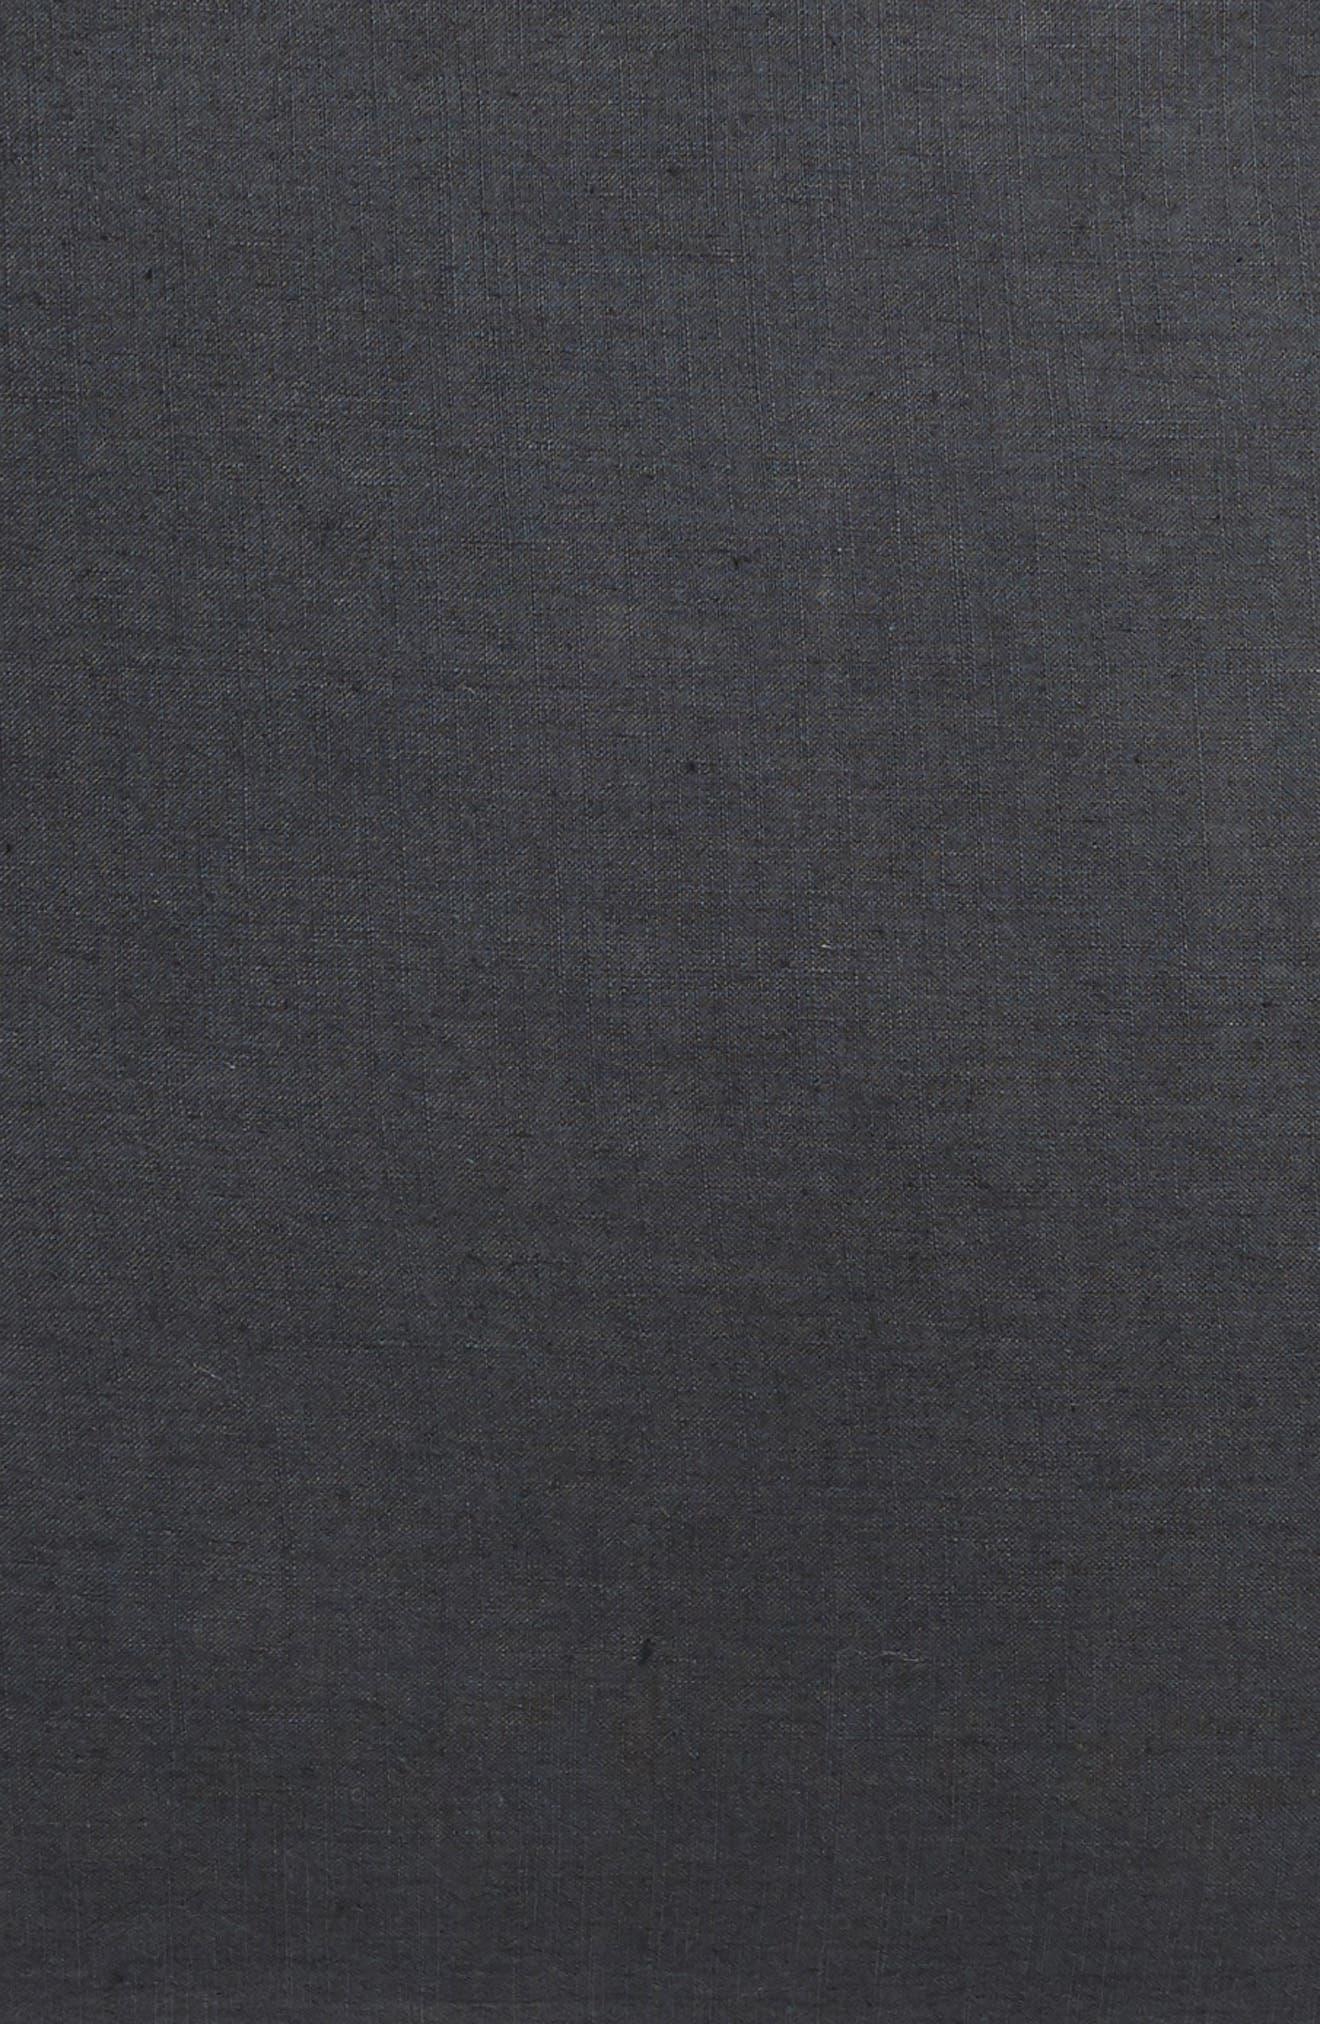 TREASURE & BOND, Relaxed Cotton & Linen Euro Sham, Alternate thumbnail 3, color, GREY ONYX